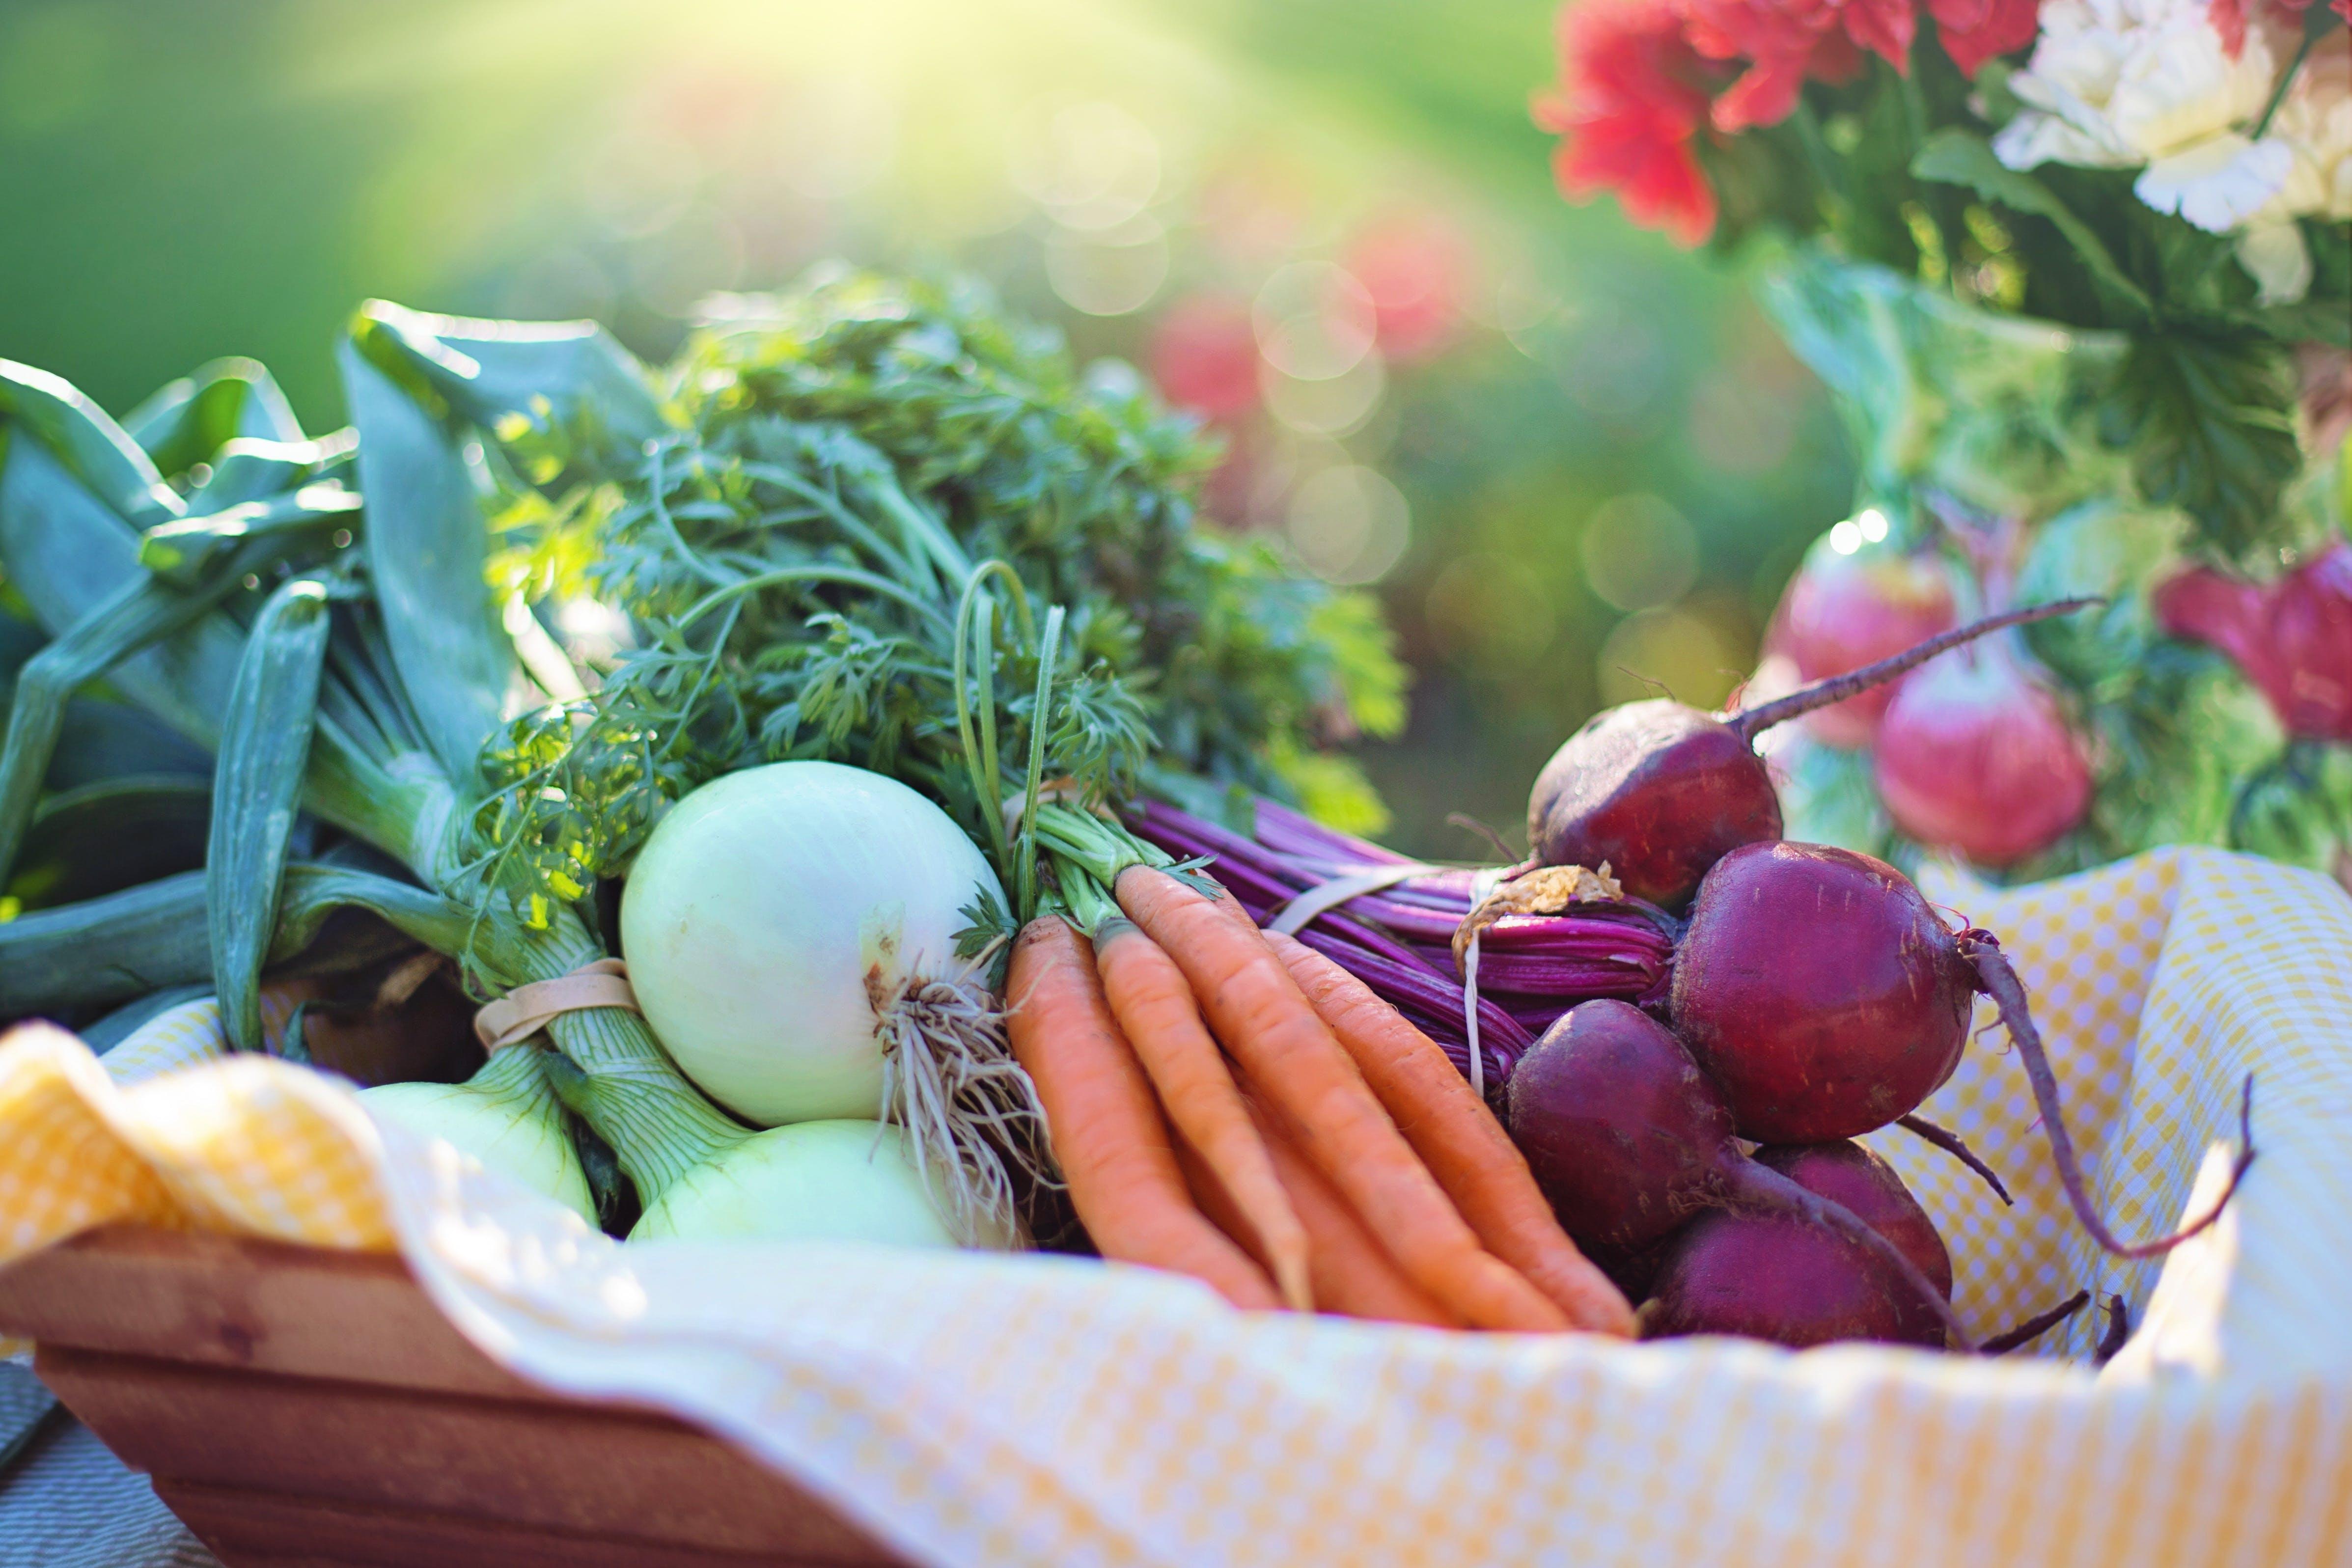 Foto profissional grátis de agricultura, alimento, aumentar, beterraba